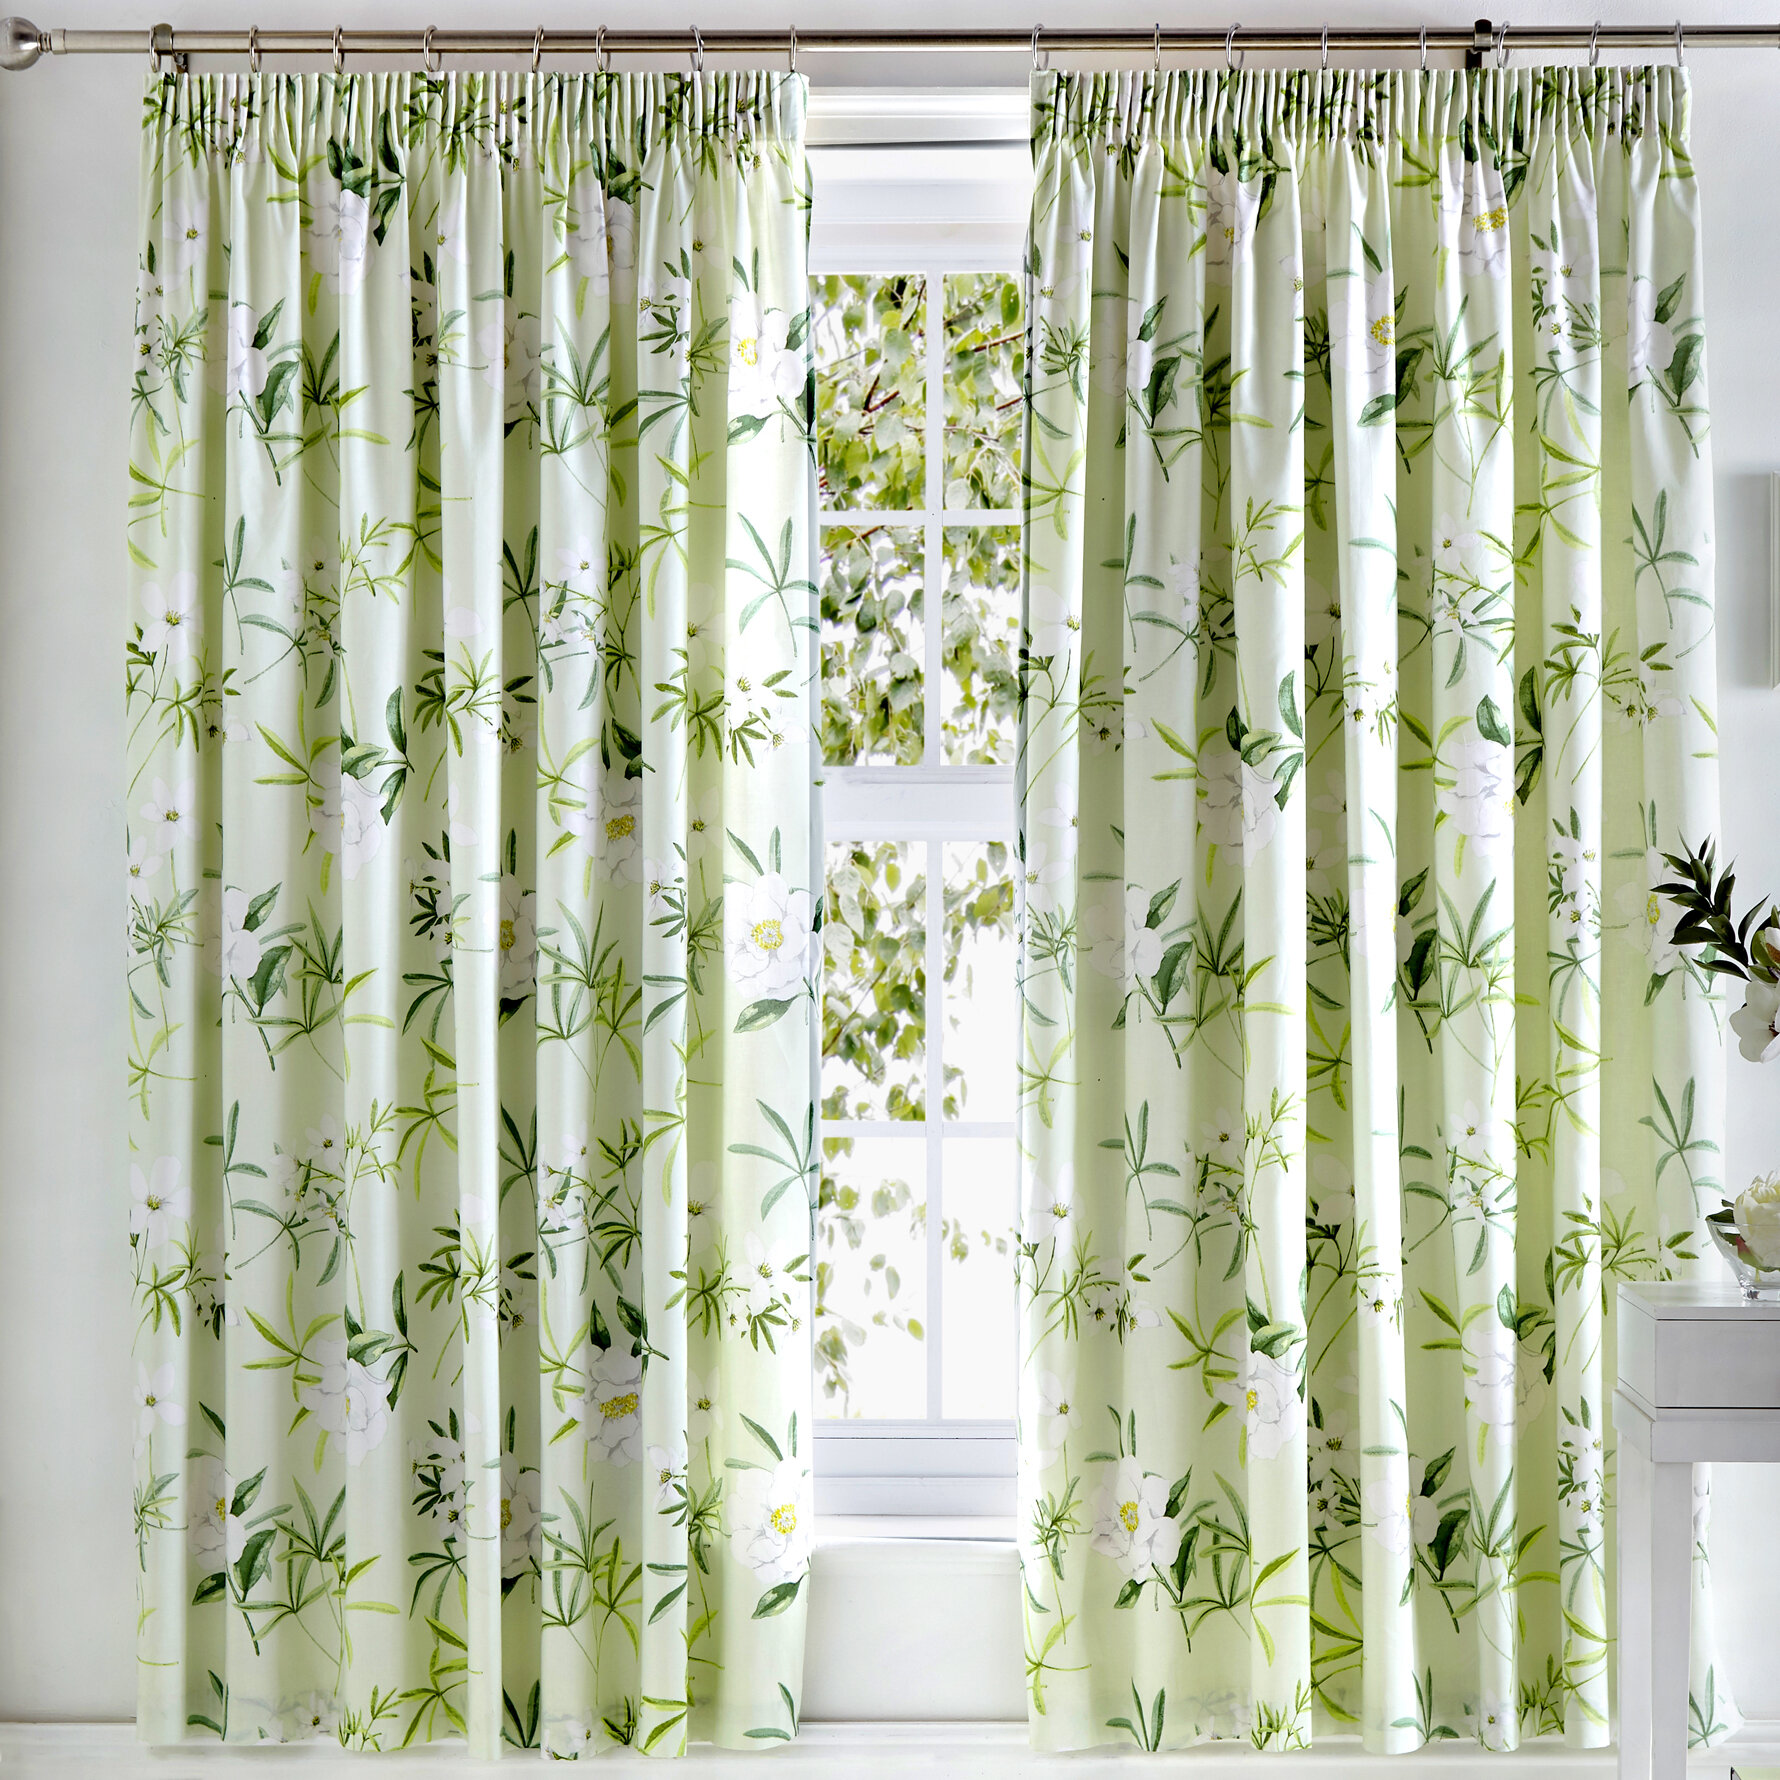 krausgrill pencil pleat room darkening curtains